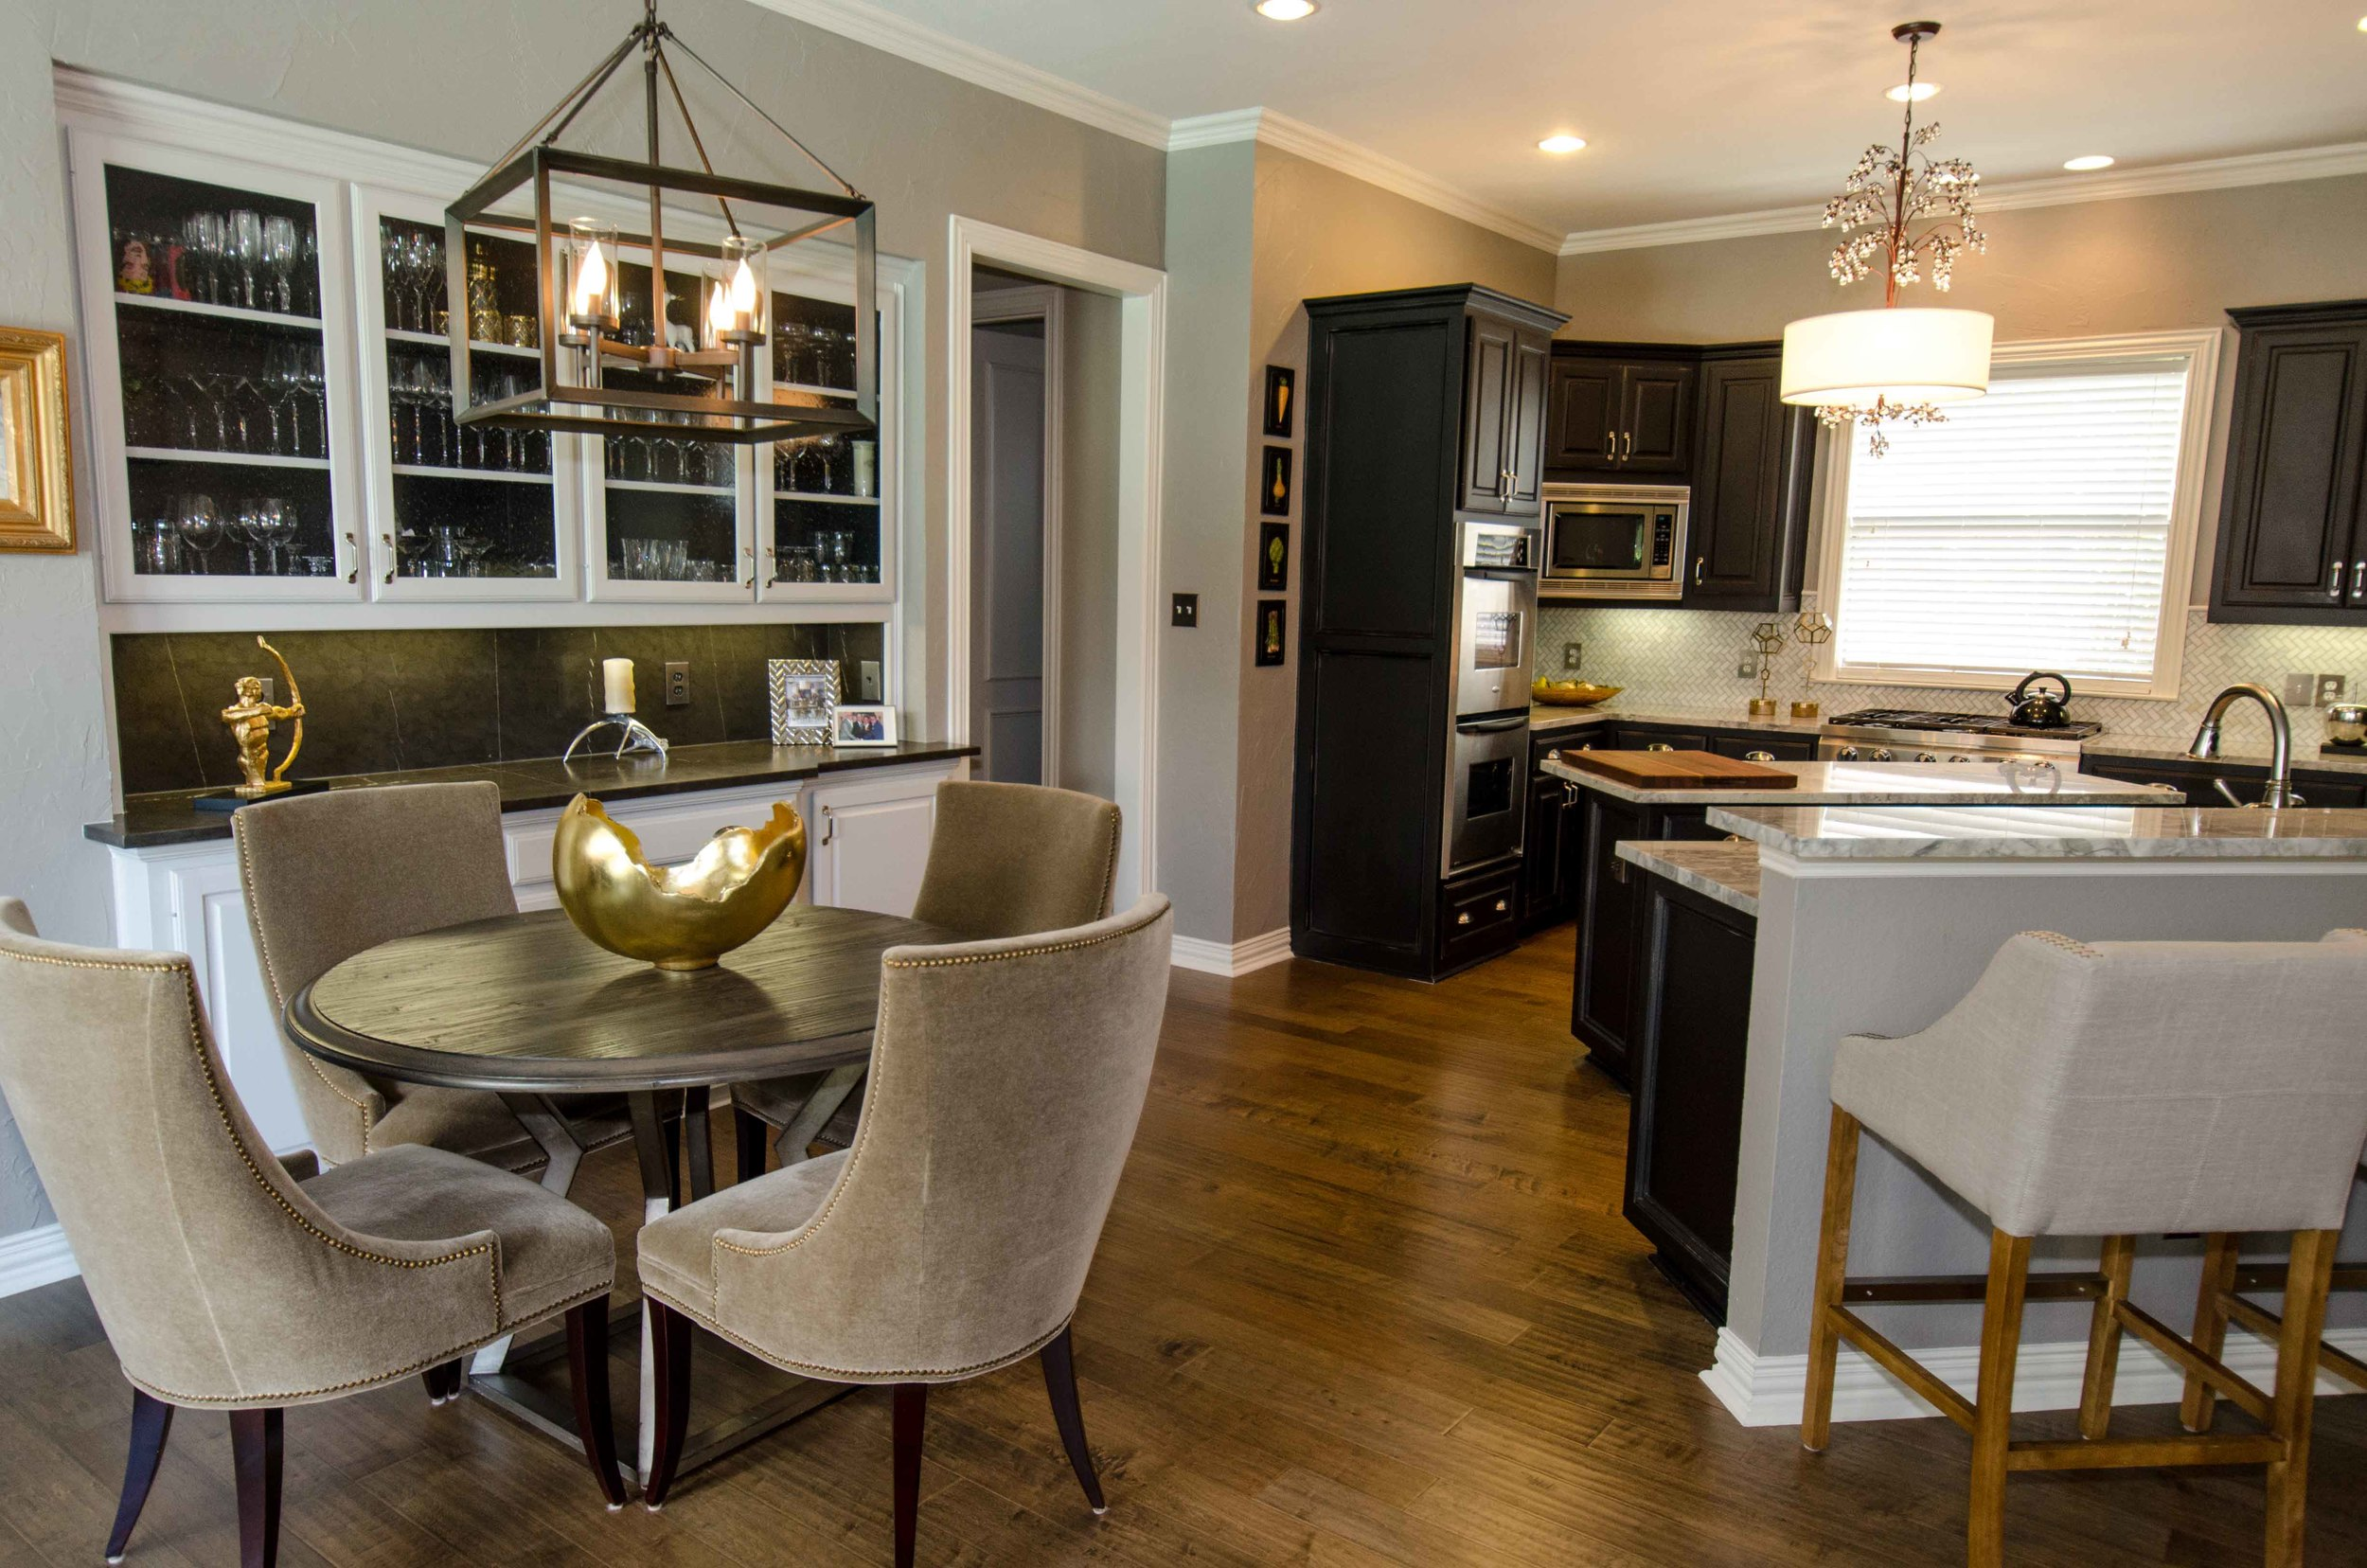 Build in dining storage